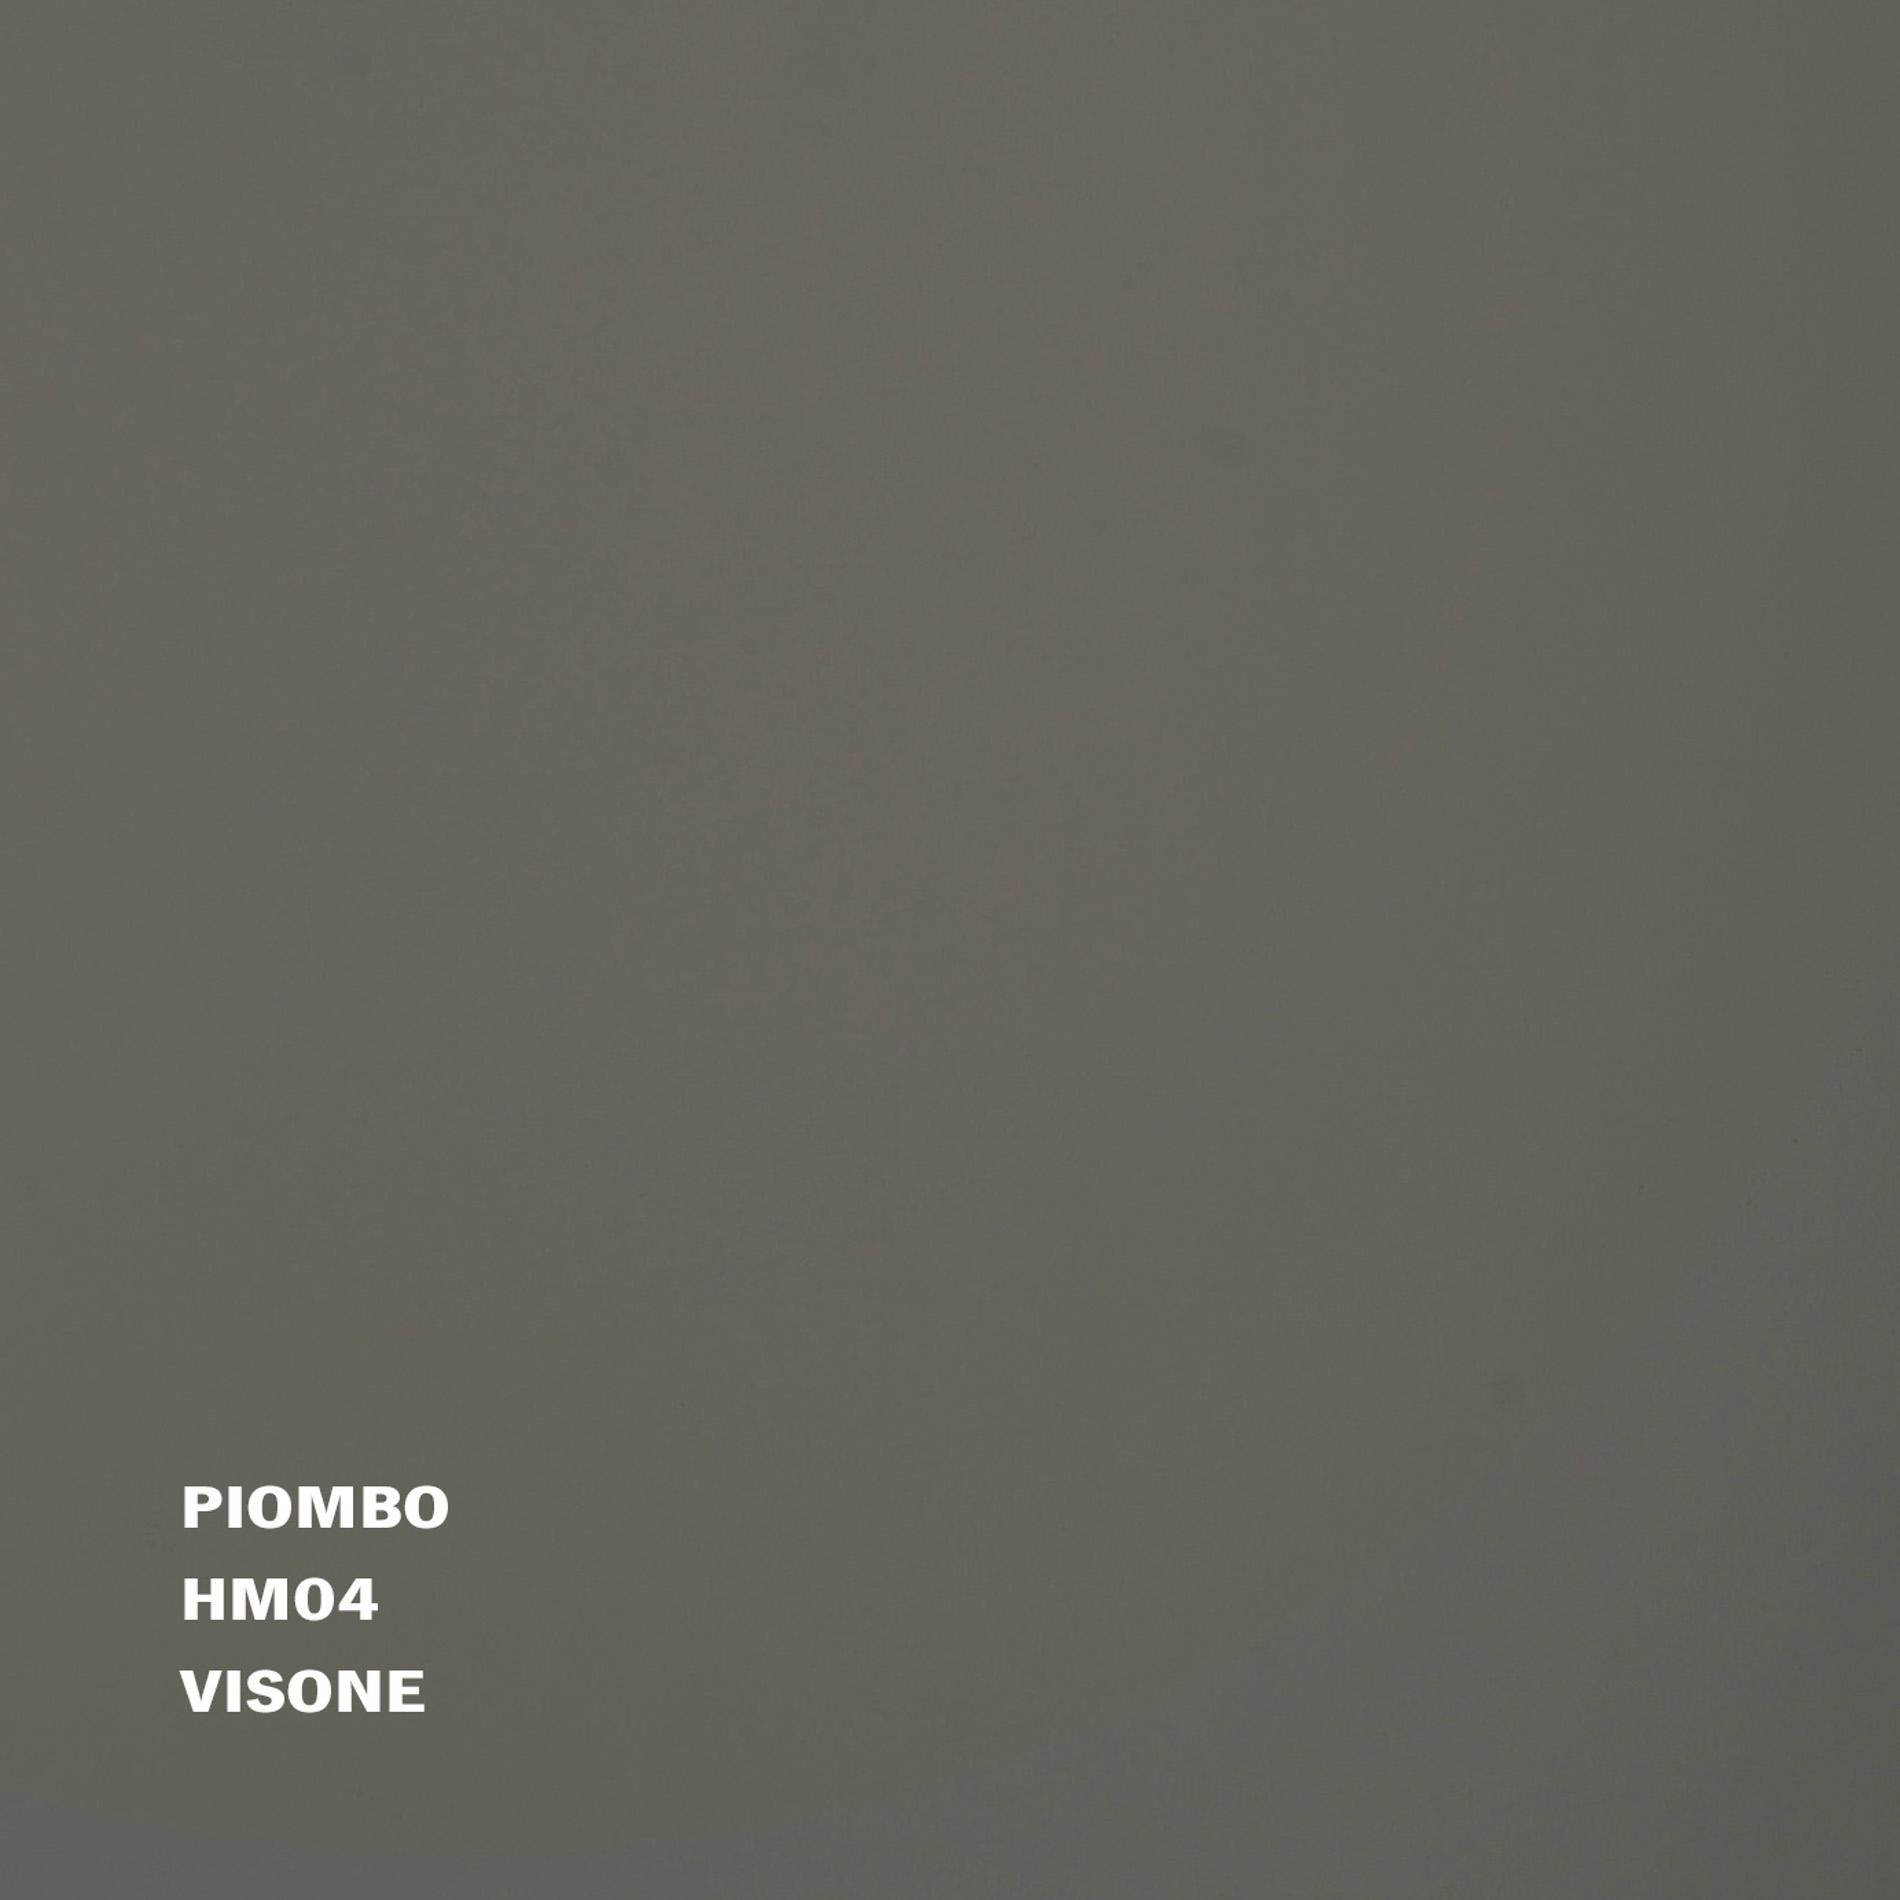 piombo_hm04